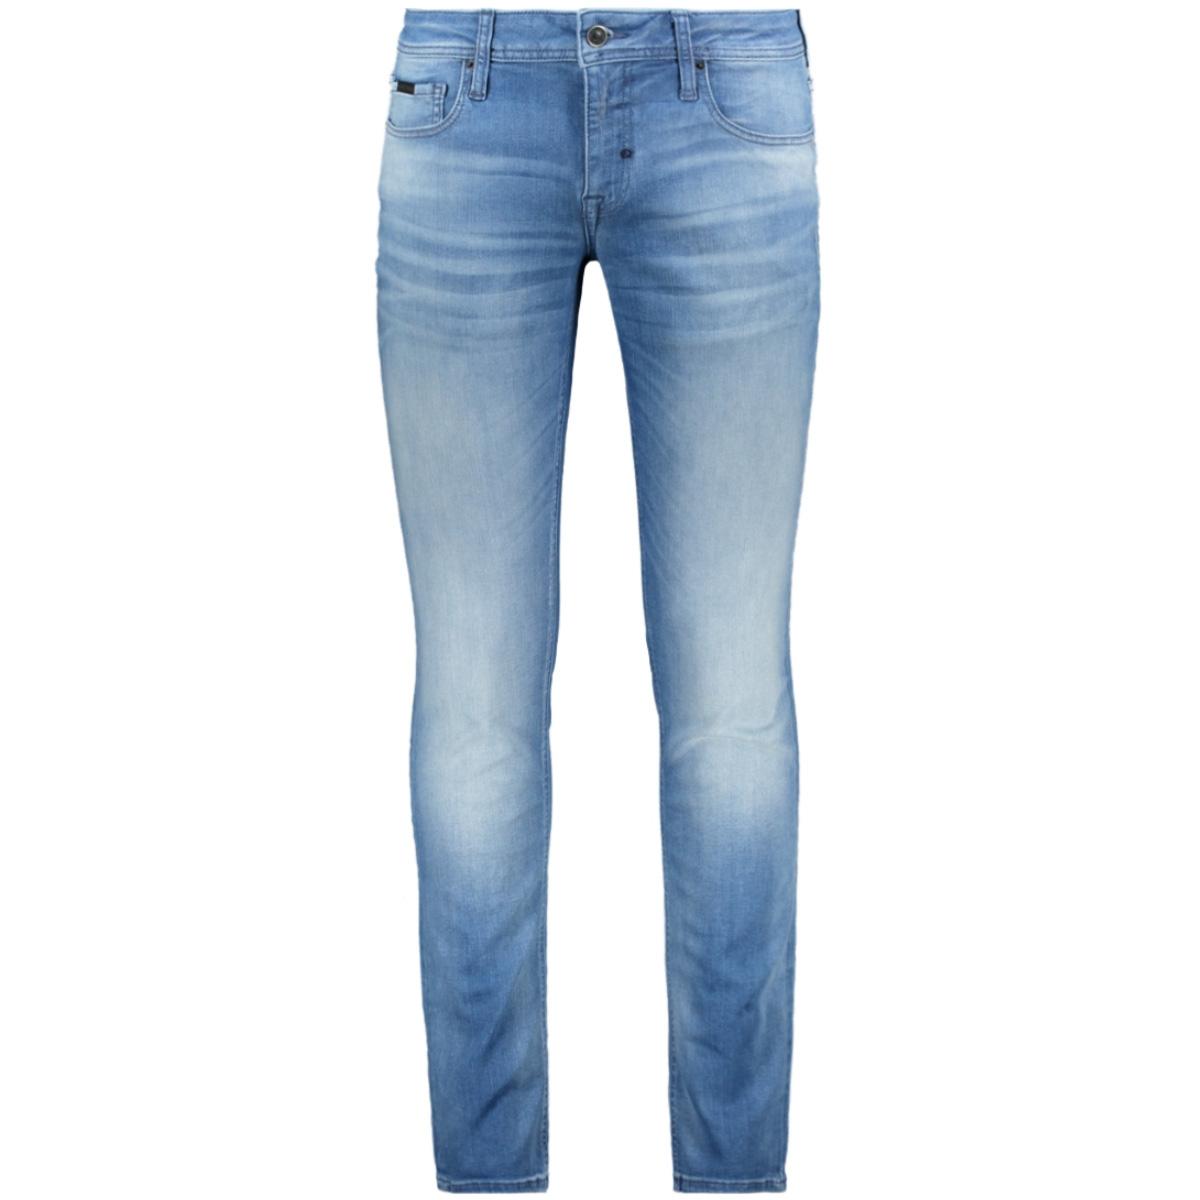 jeans tapered ozzy mmdt00241 antony morato jeans 7010 blue denim w01195